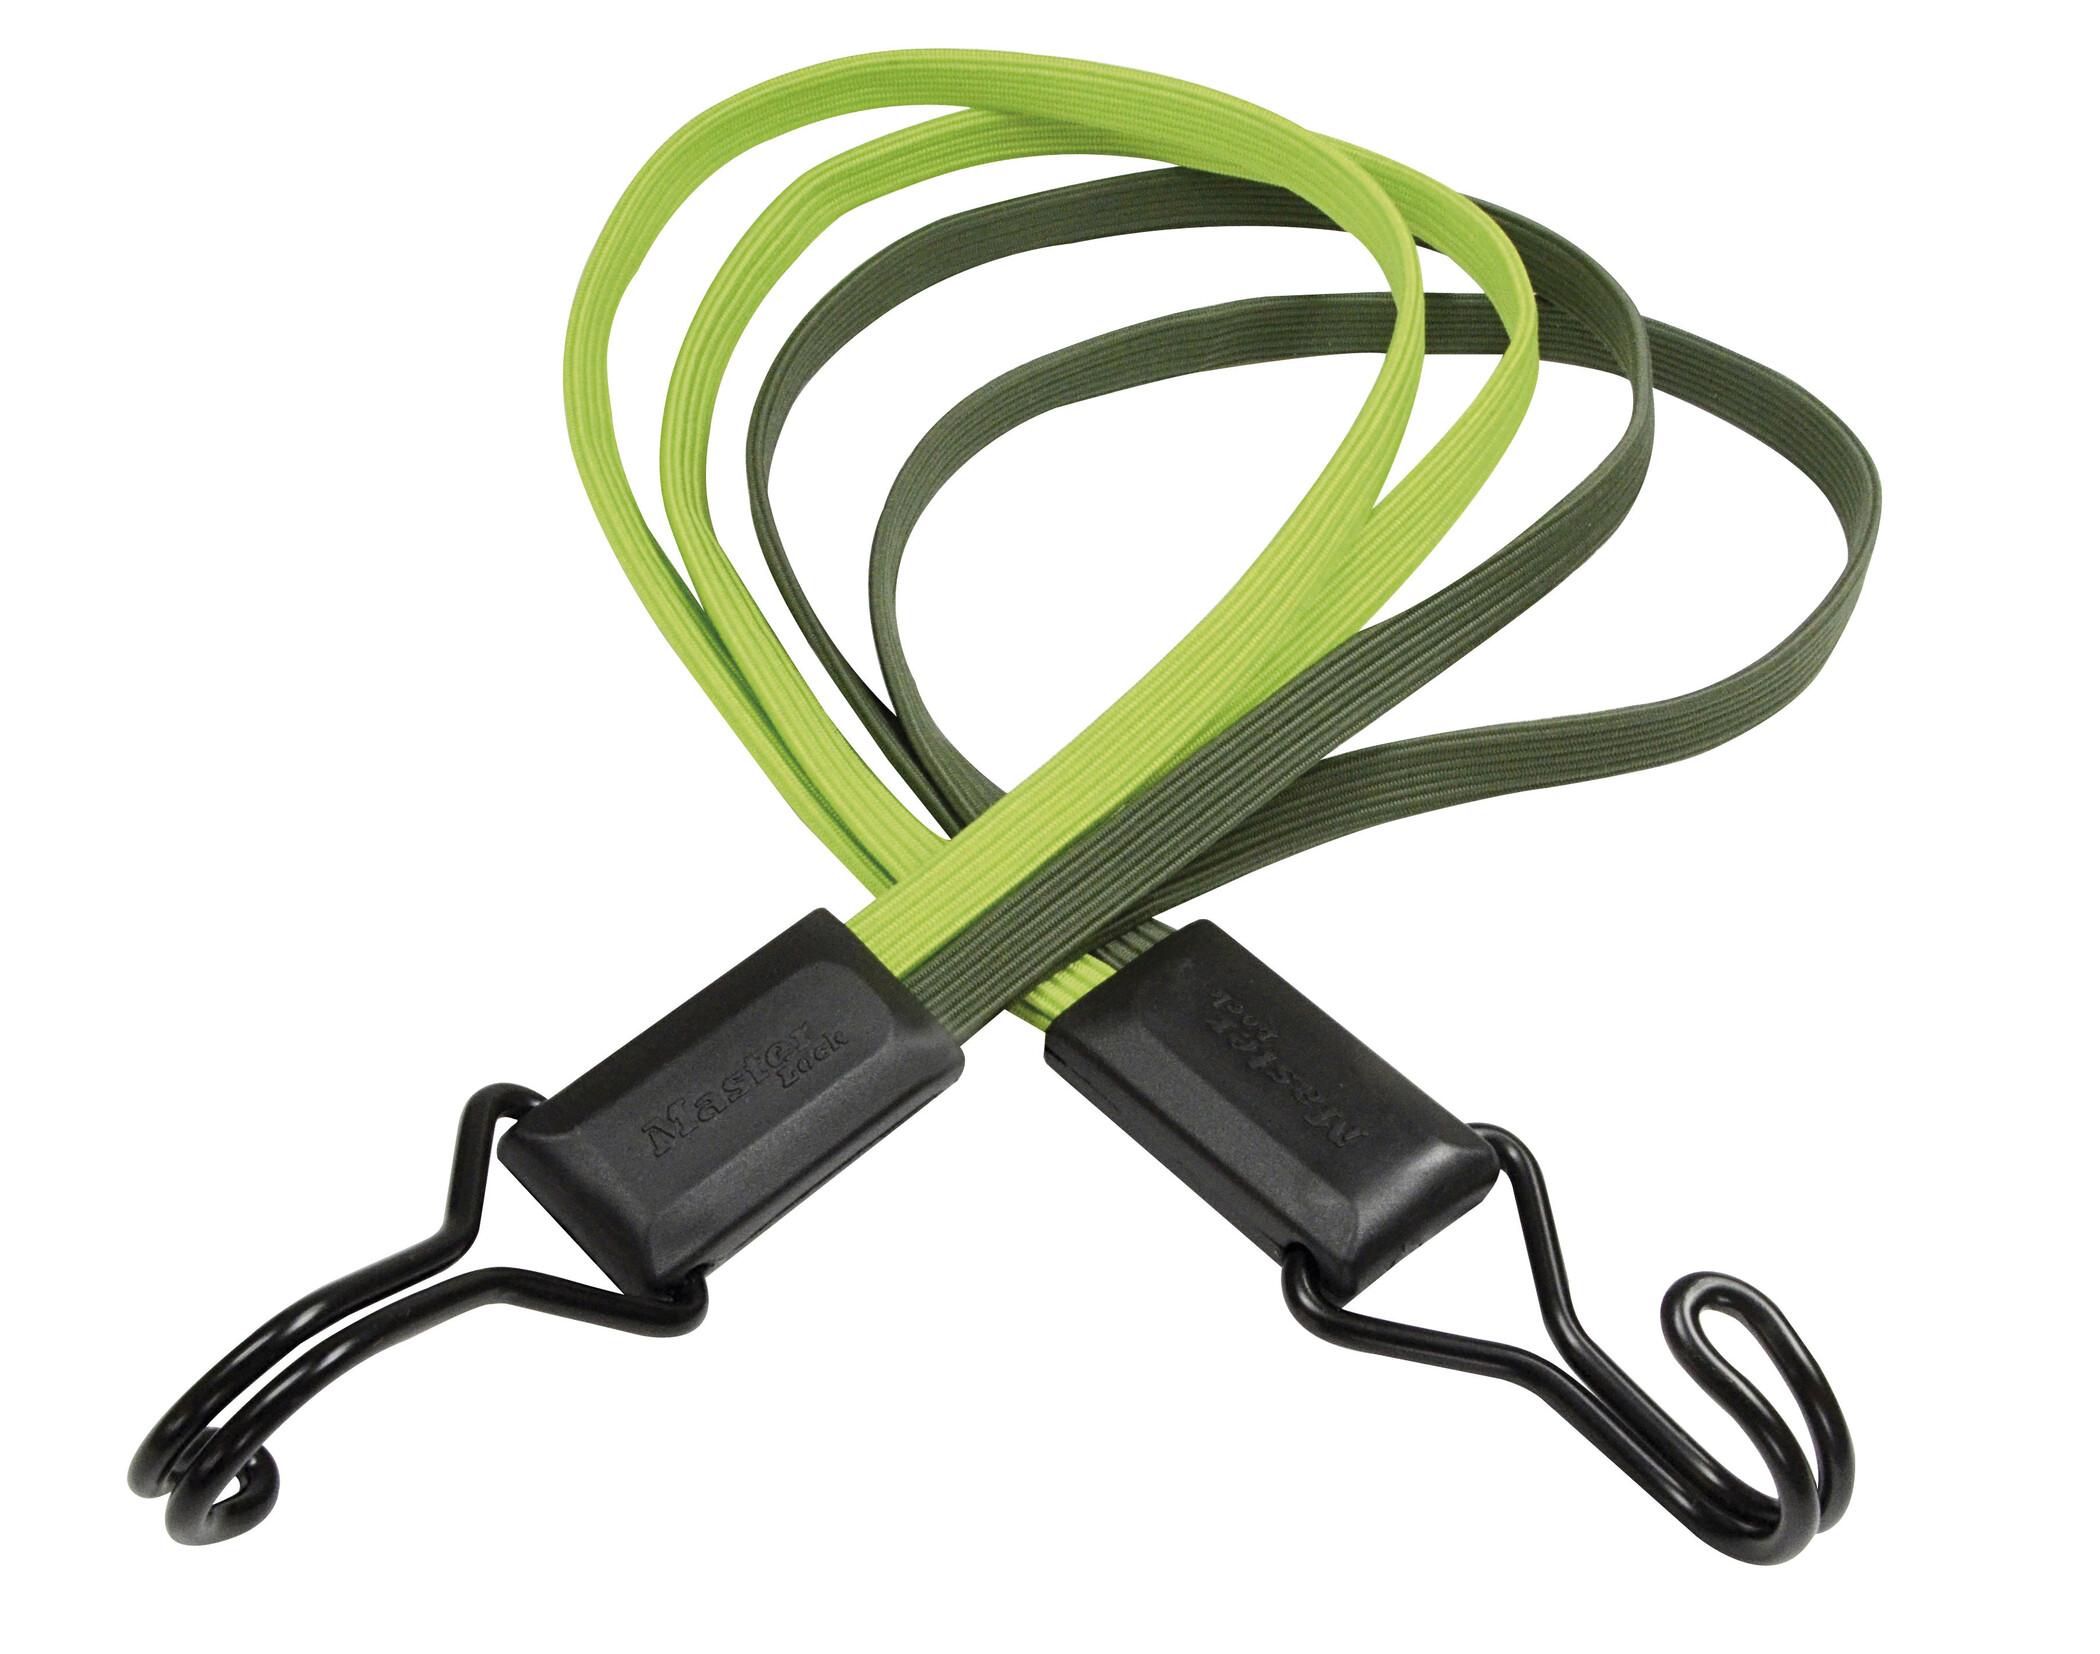 Masterlock Smooth Elastikker 4-speed, green/brown (2019)   item_misc